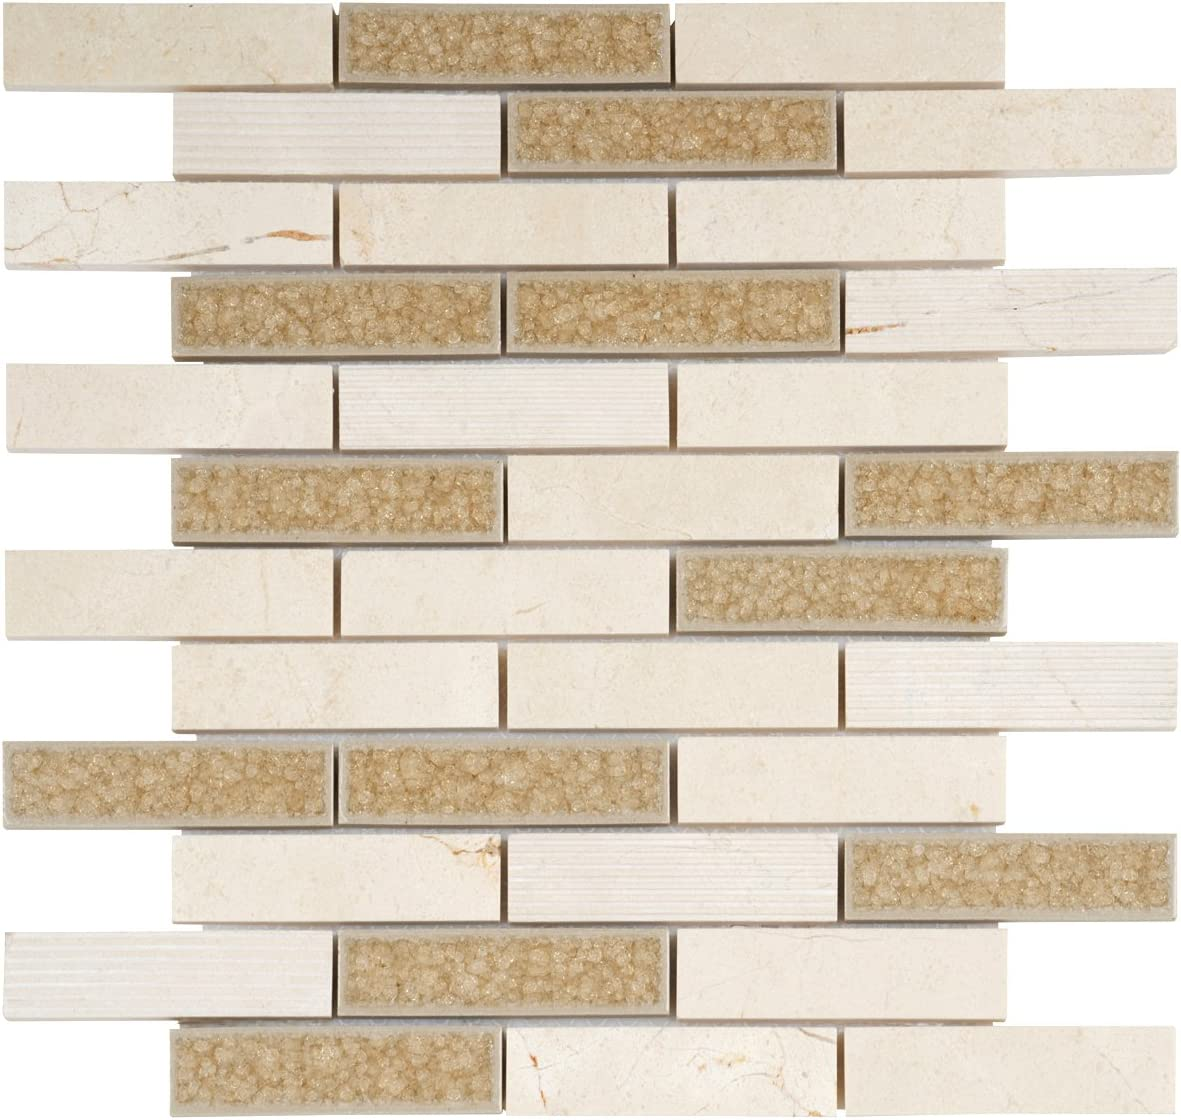 - Modket TDH45MO Beige Cream Crema Marfil Marble Mosaic Tile